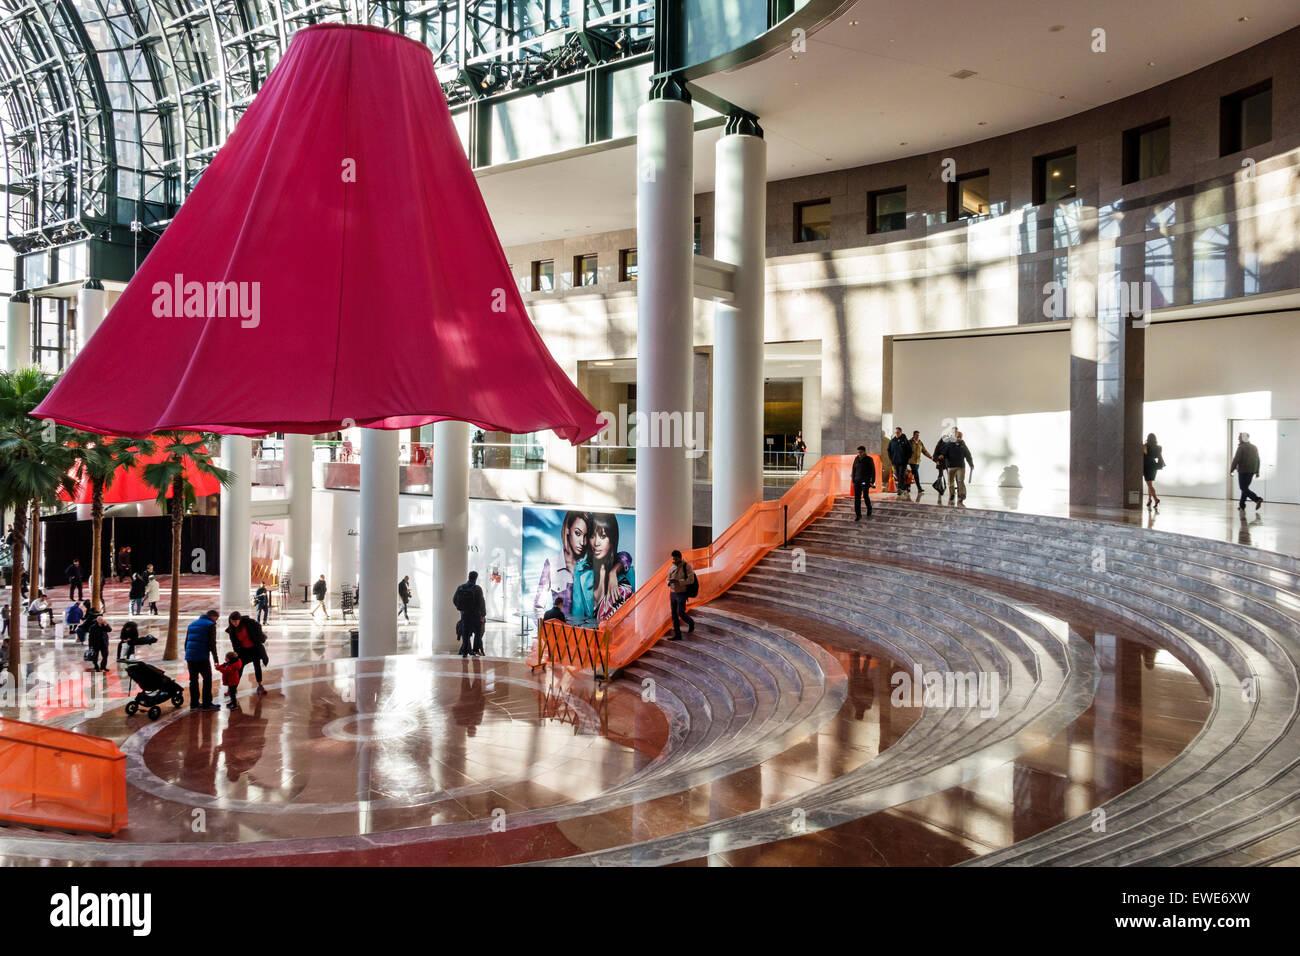 Tolle Hobby Lobby Gerahmte Kunst Galerie - Benutzerdefinierte ...